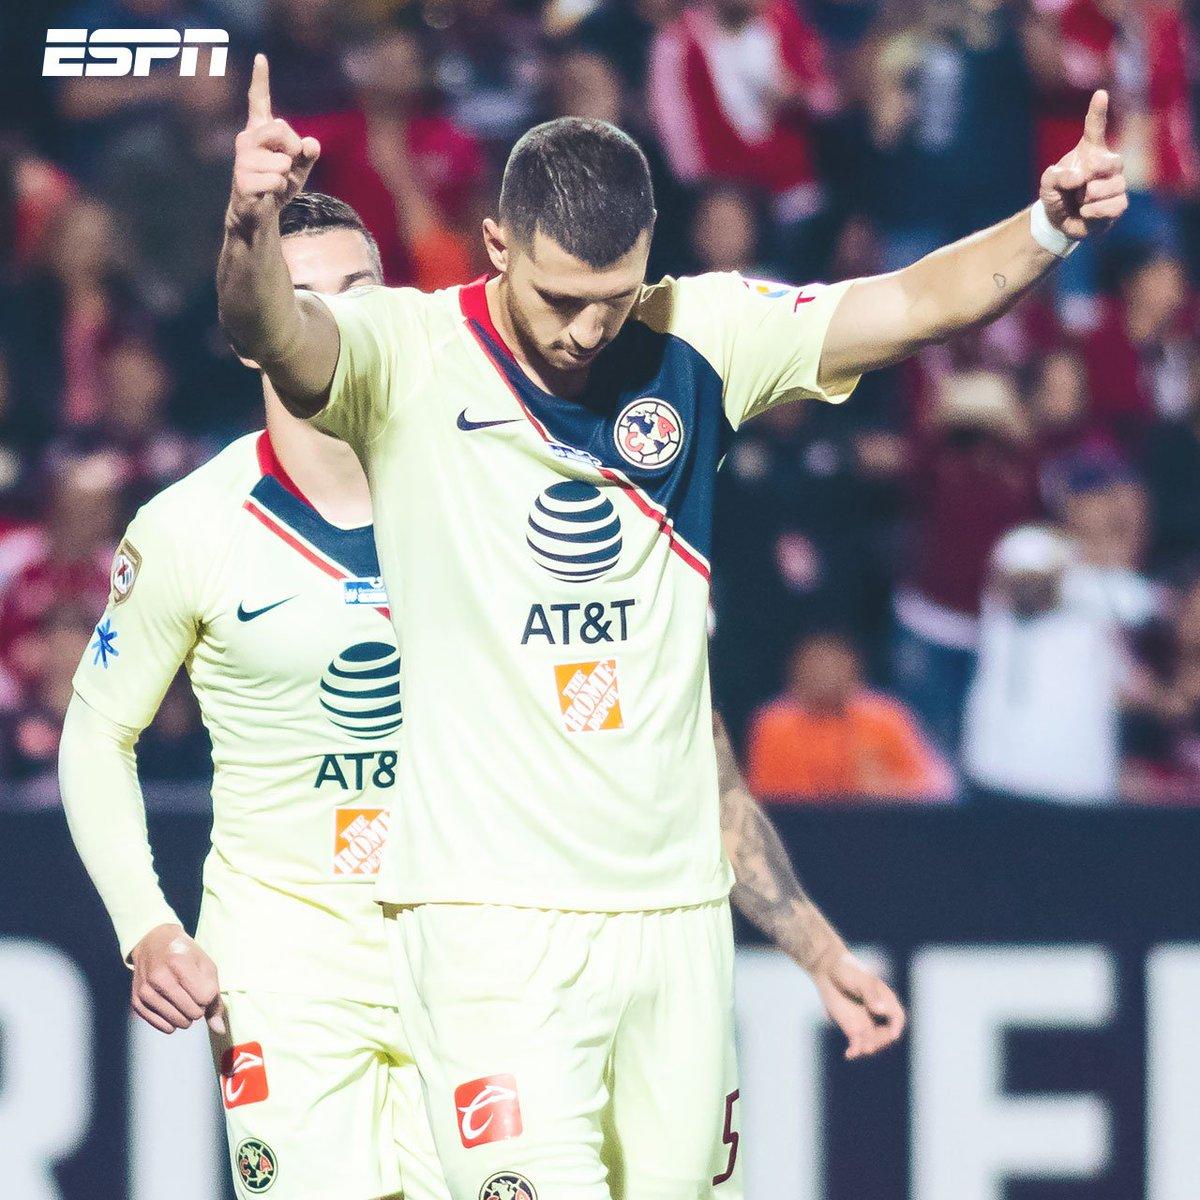 @ESPNmx's photo on Guido Rodríguez